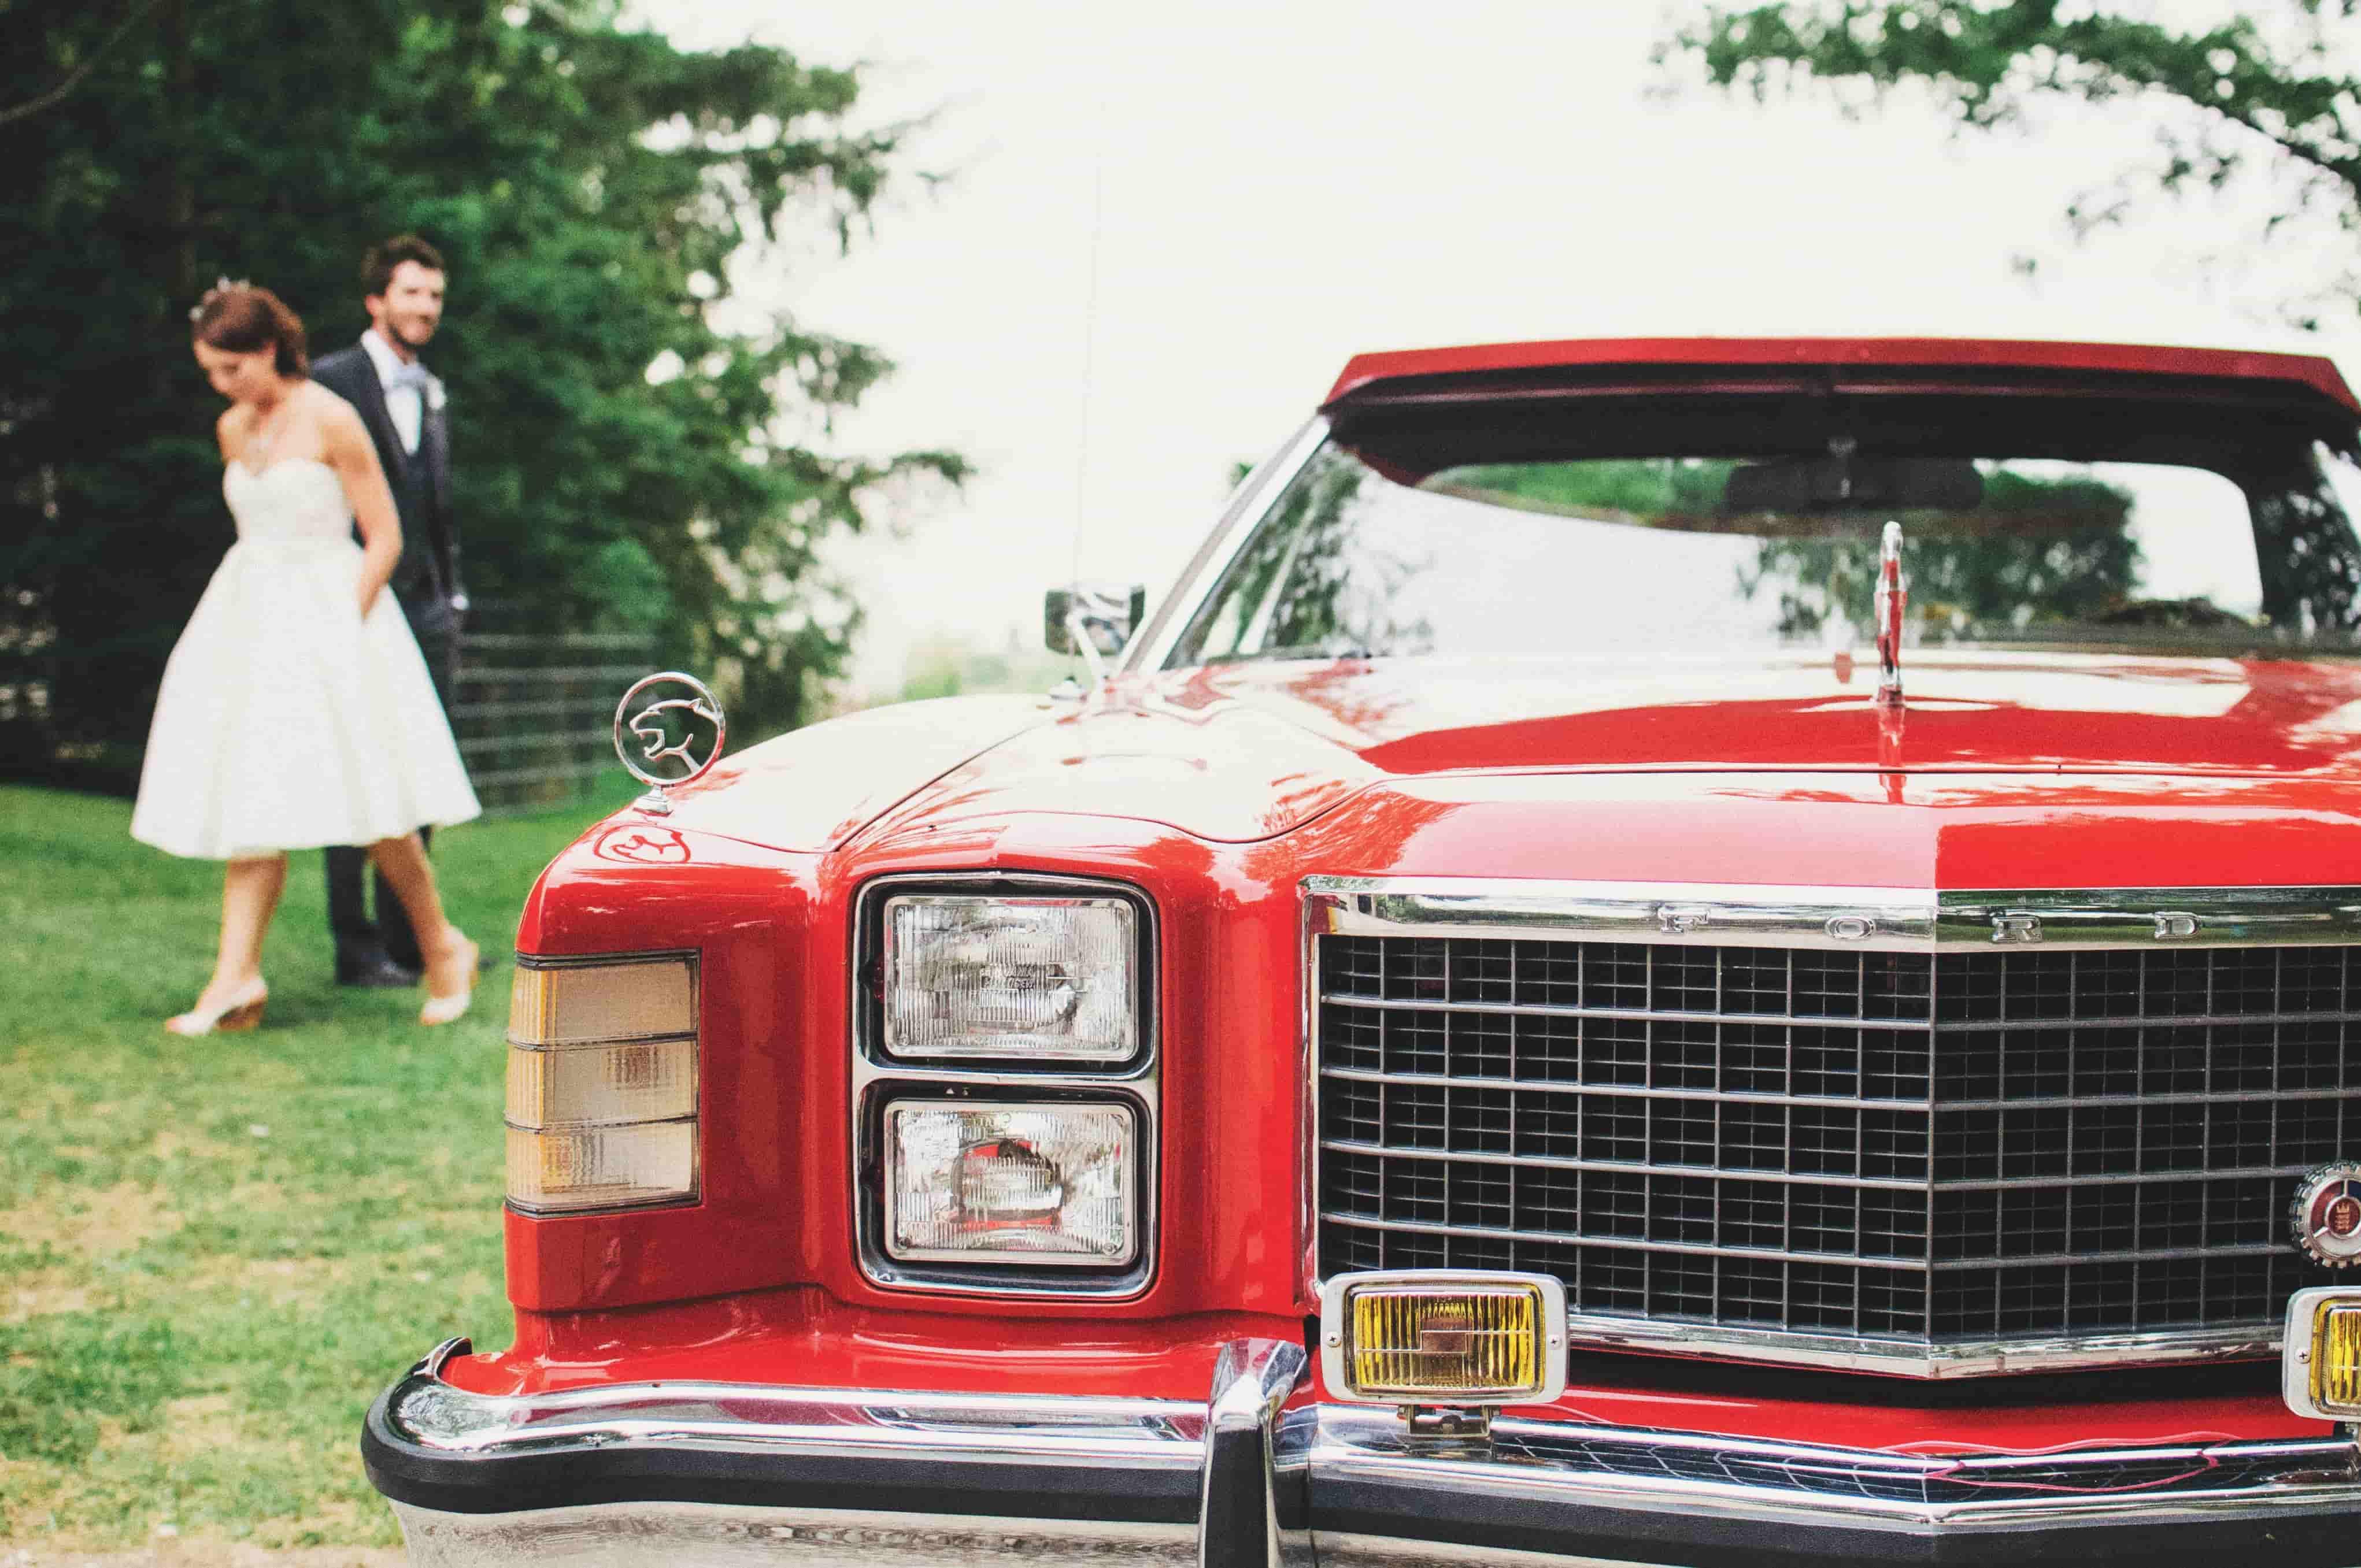 wedding venue transport